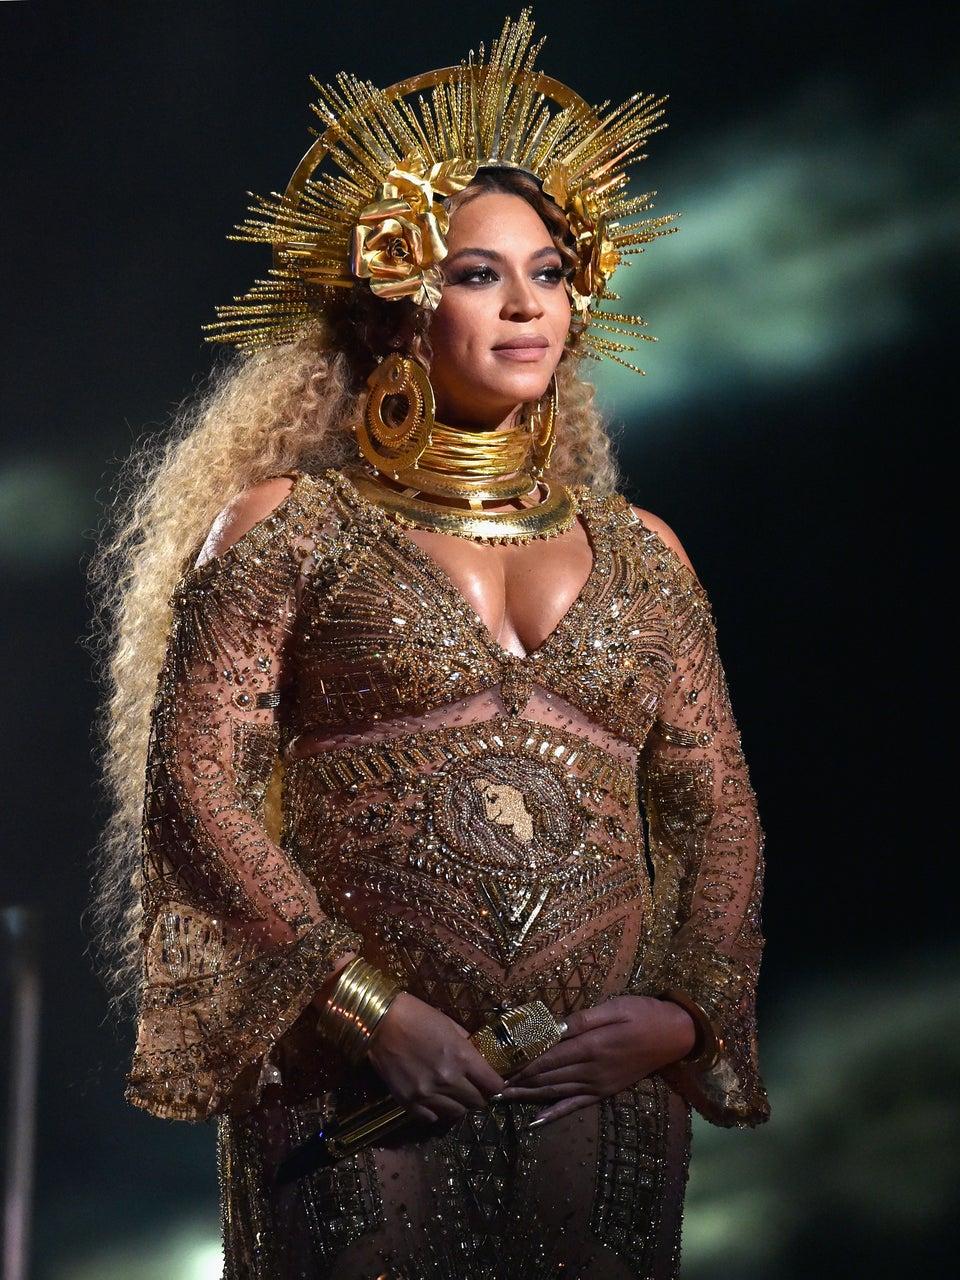 Beyoncé Being Eyed To Play Nala In The Upcoming 'Lion King' Remake